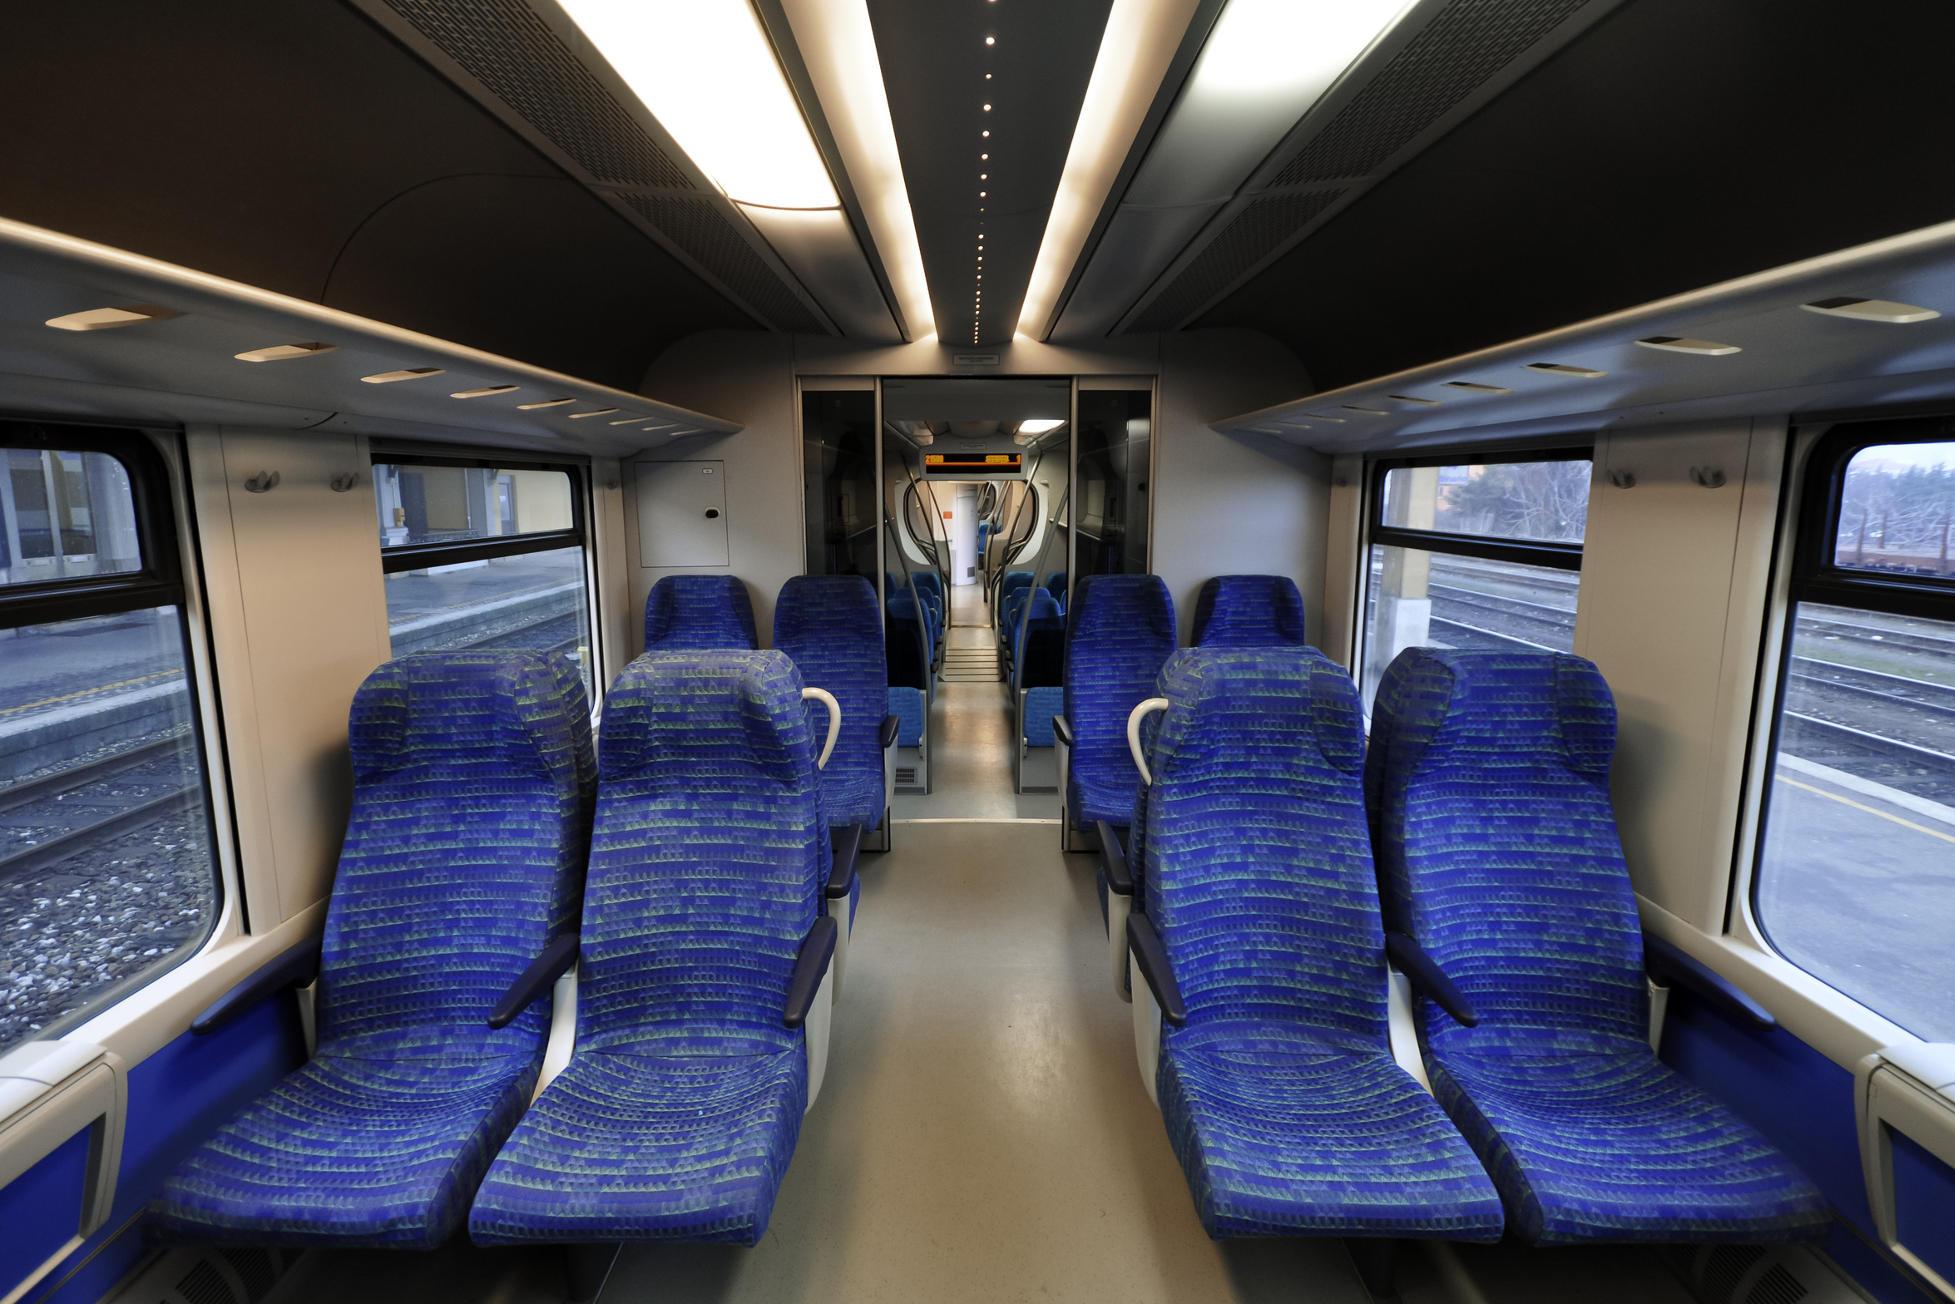 Vacant seats inside an empty passenger train